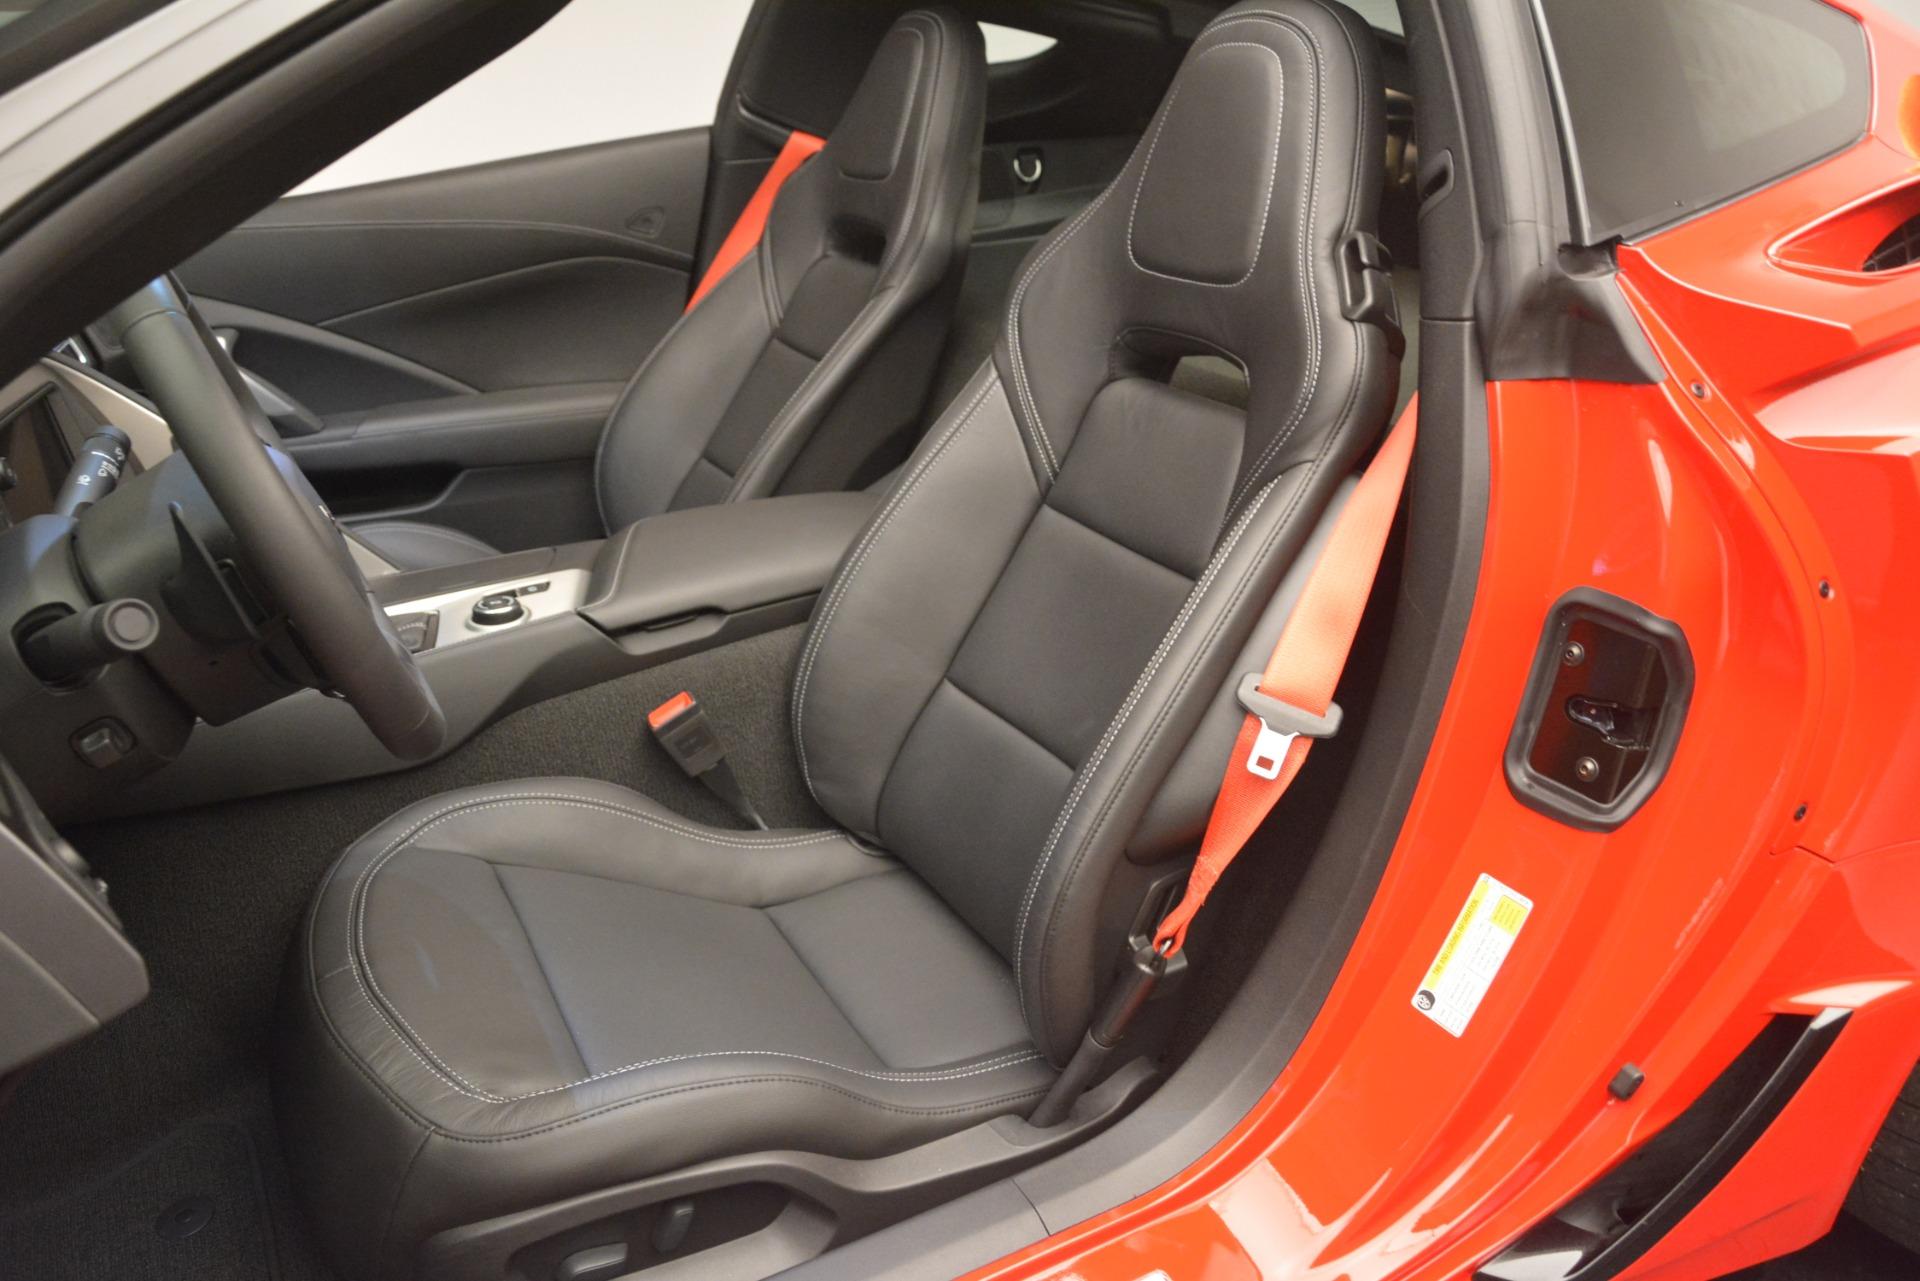 Used 2019 Chevrolet Corvette Grand Sport For Sale In Greenwich, CT 3169_p21